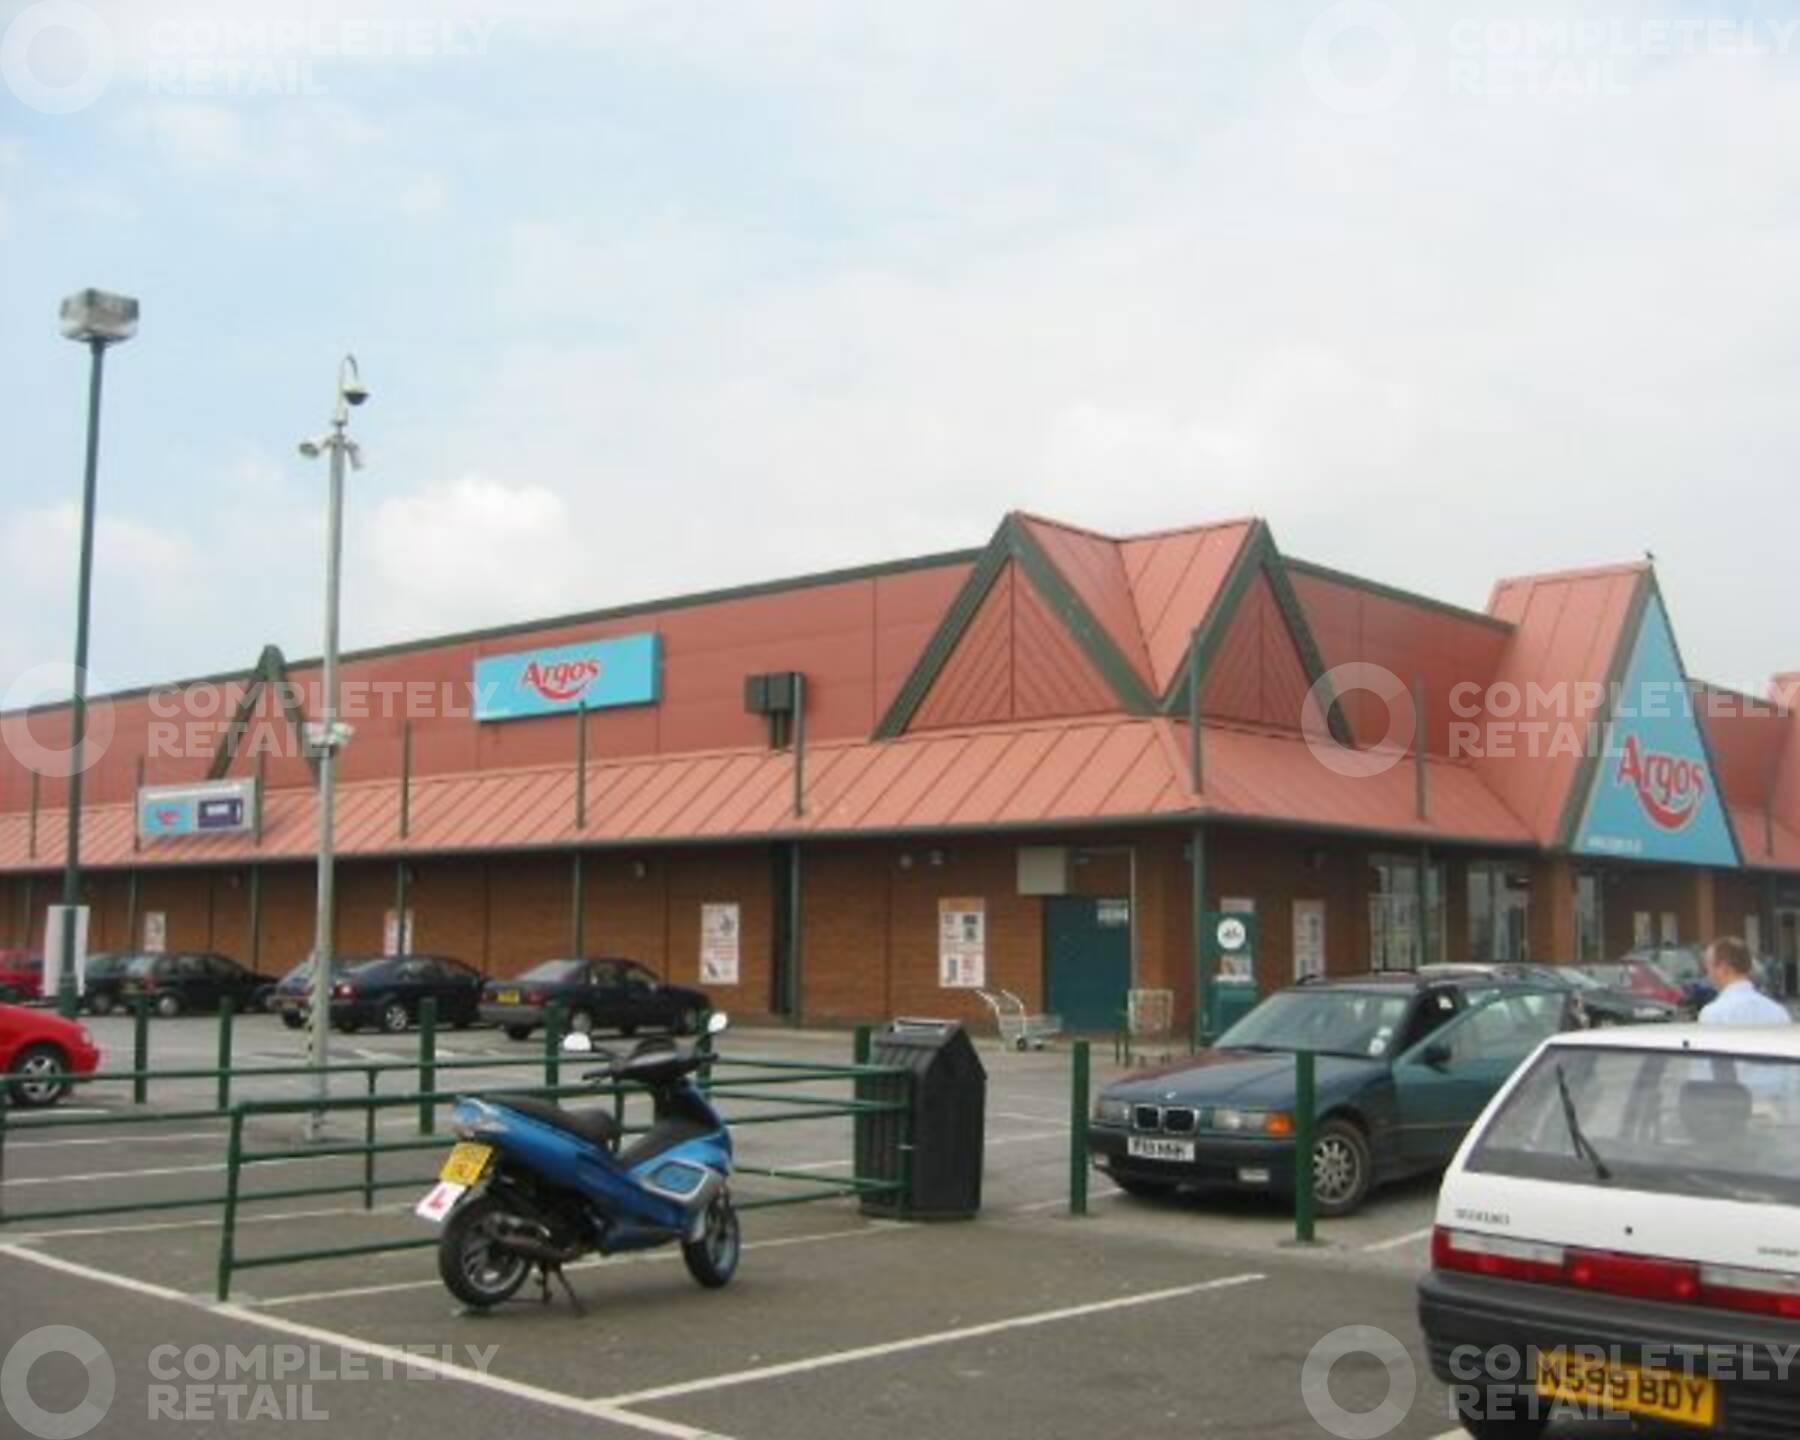 Admiral Retail Park